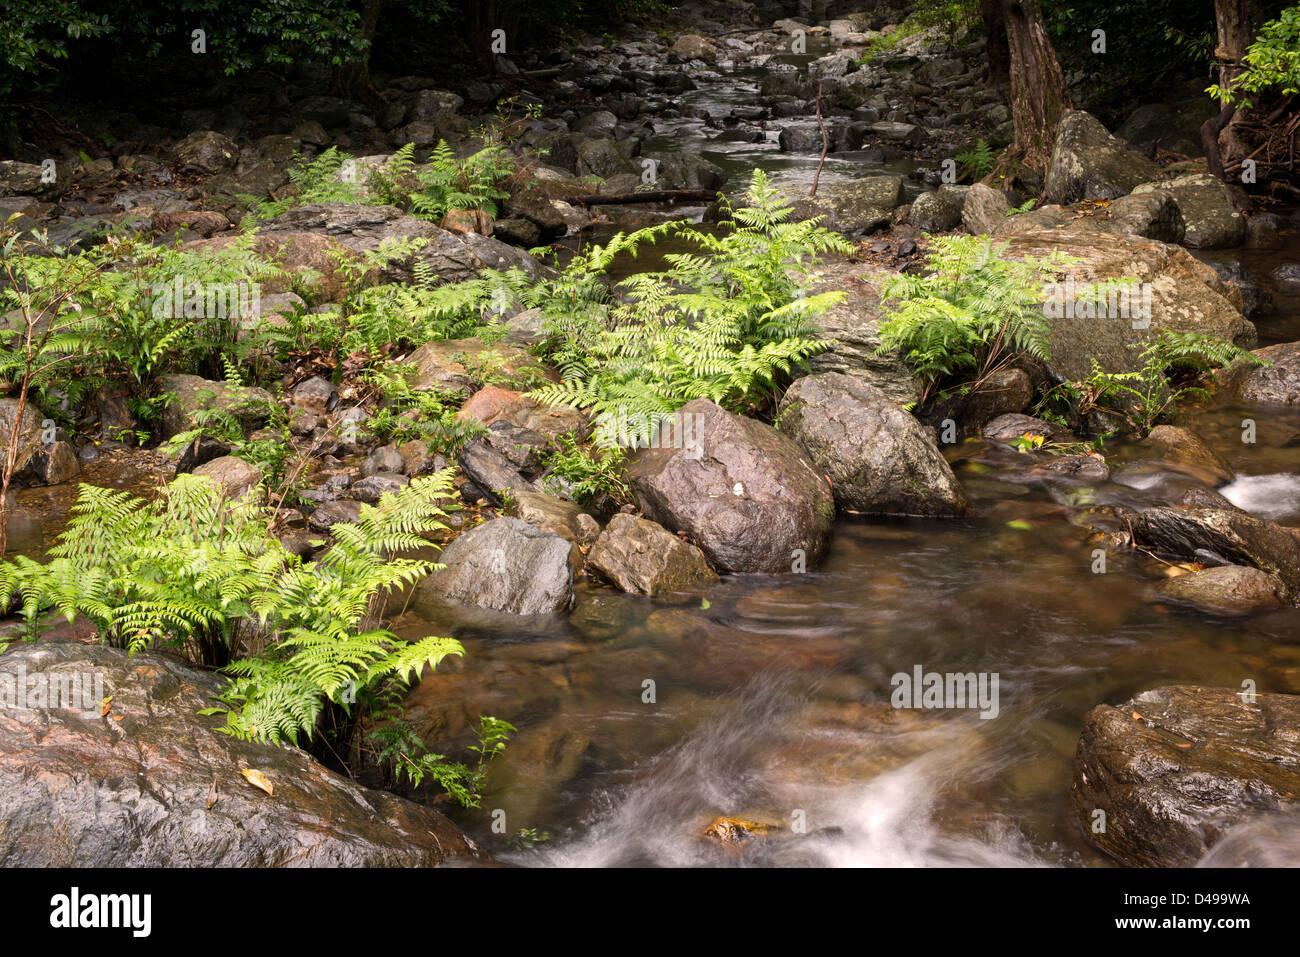 Stony Creek near Cairns, Far North Queensland, Australia - Stock Image